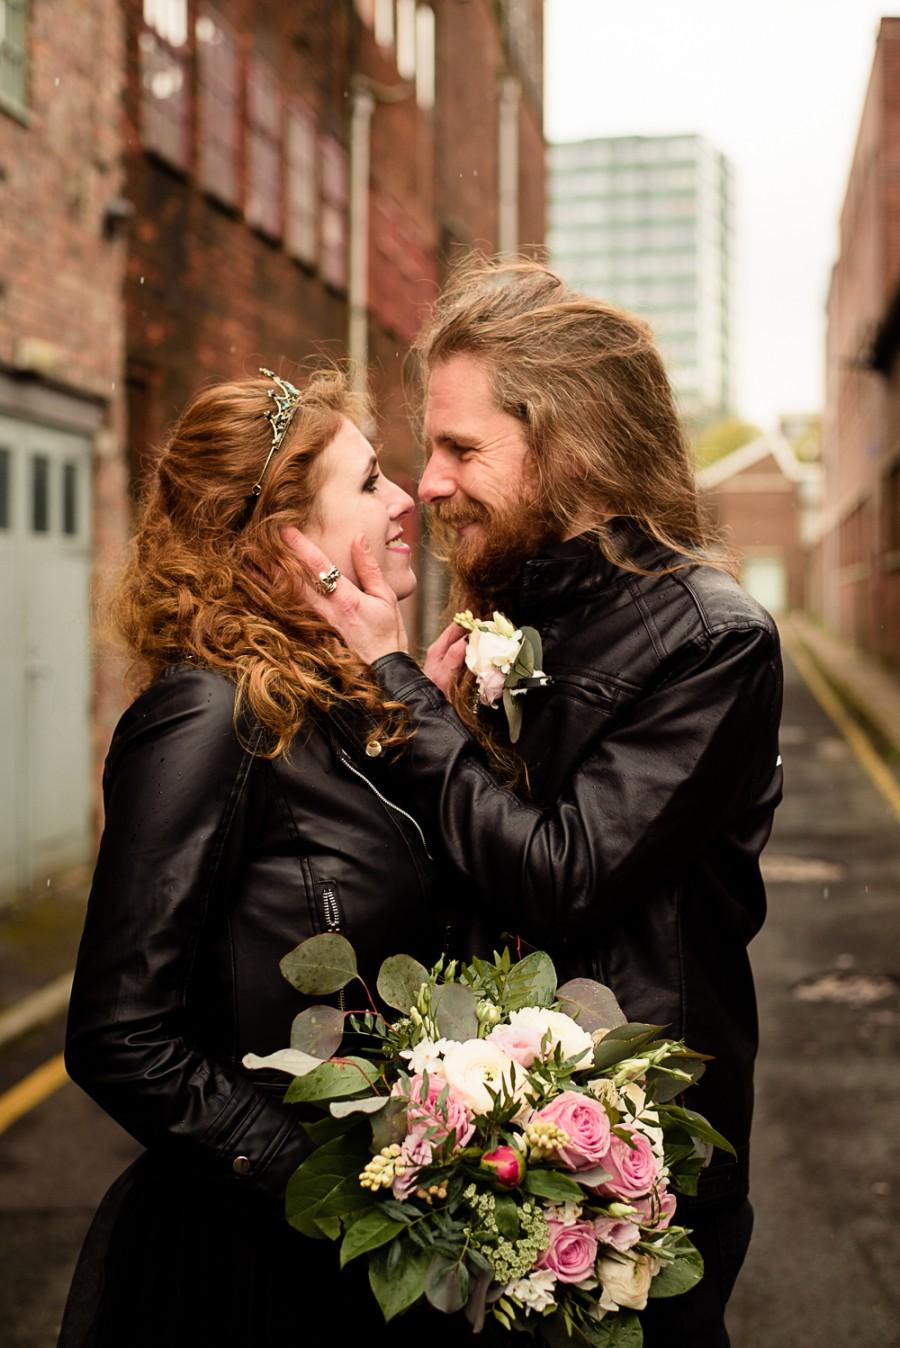 gothic city wedding - alternative wedding - gothic micro wedding - black wedding dress - bride and groom in leather jacket - rock wedding